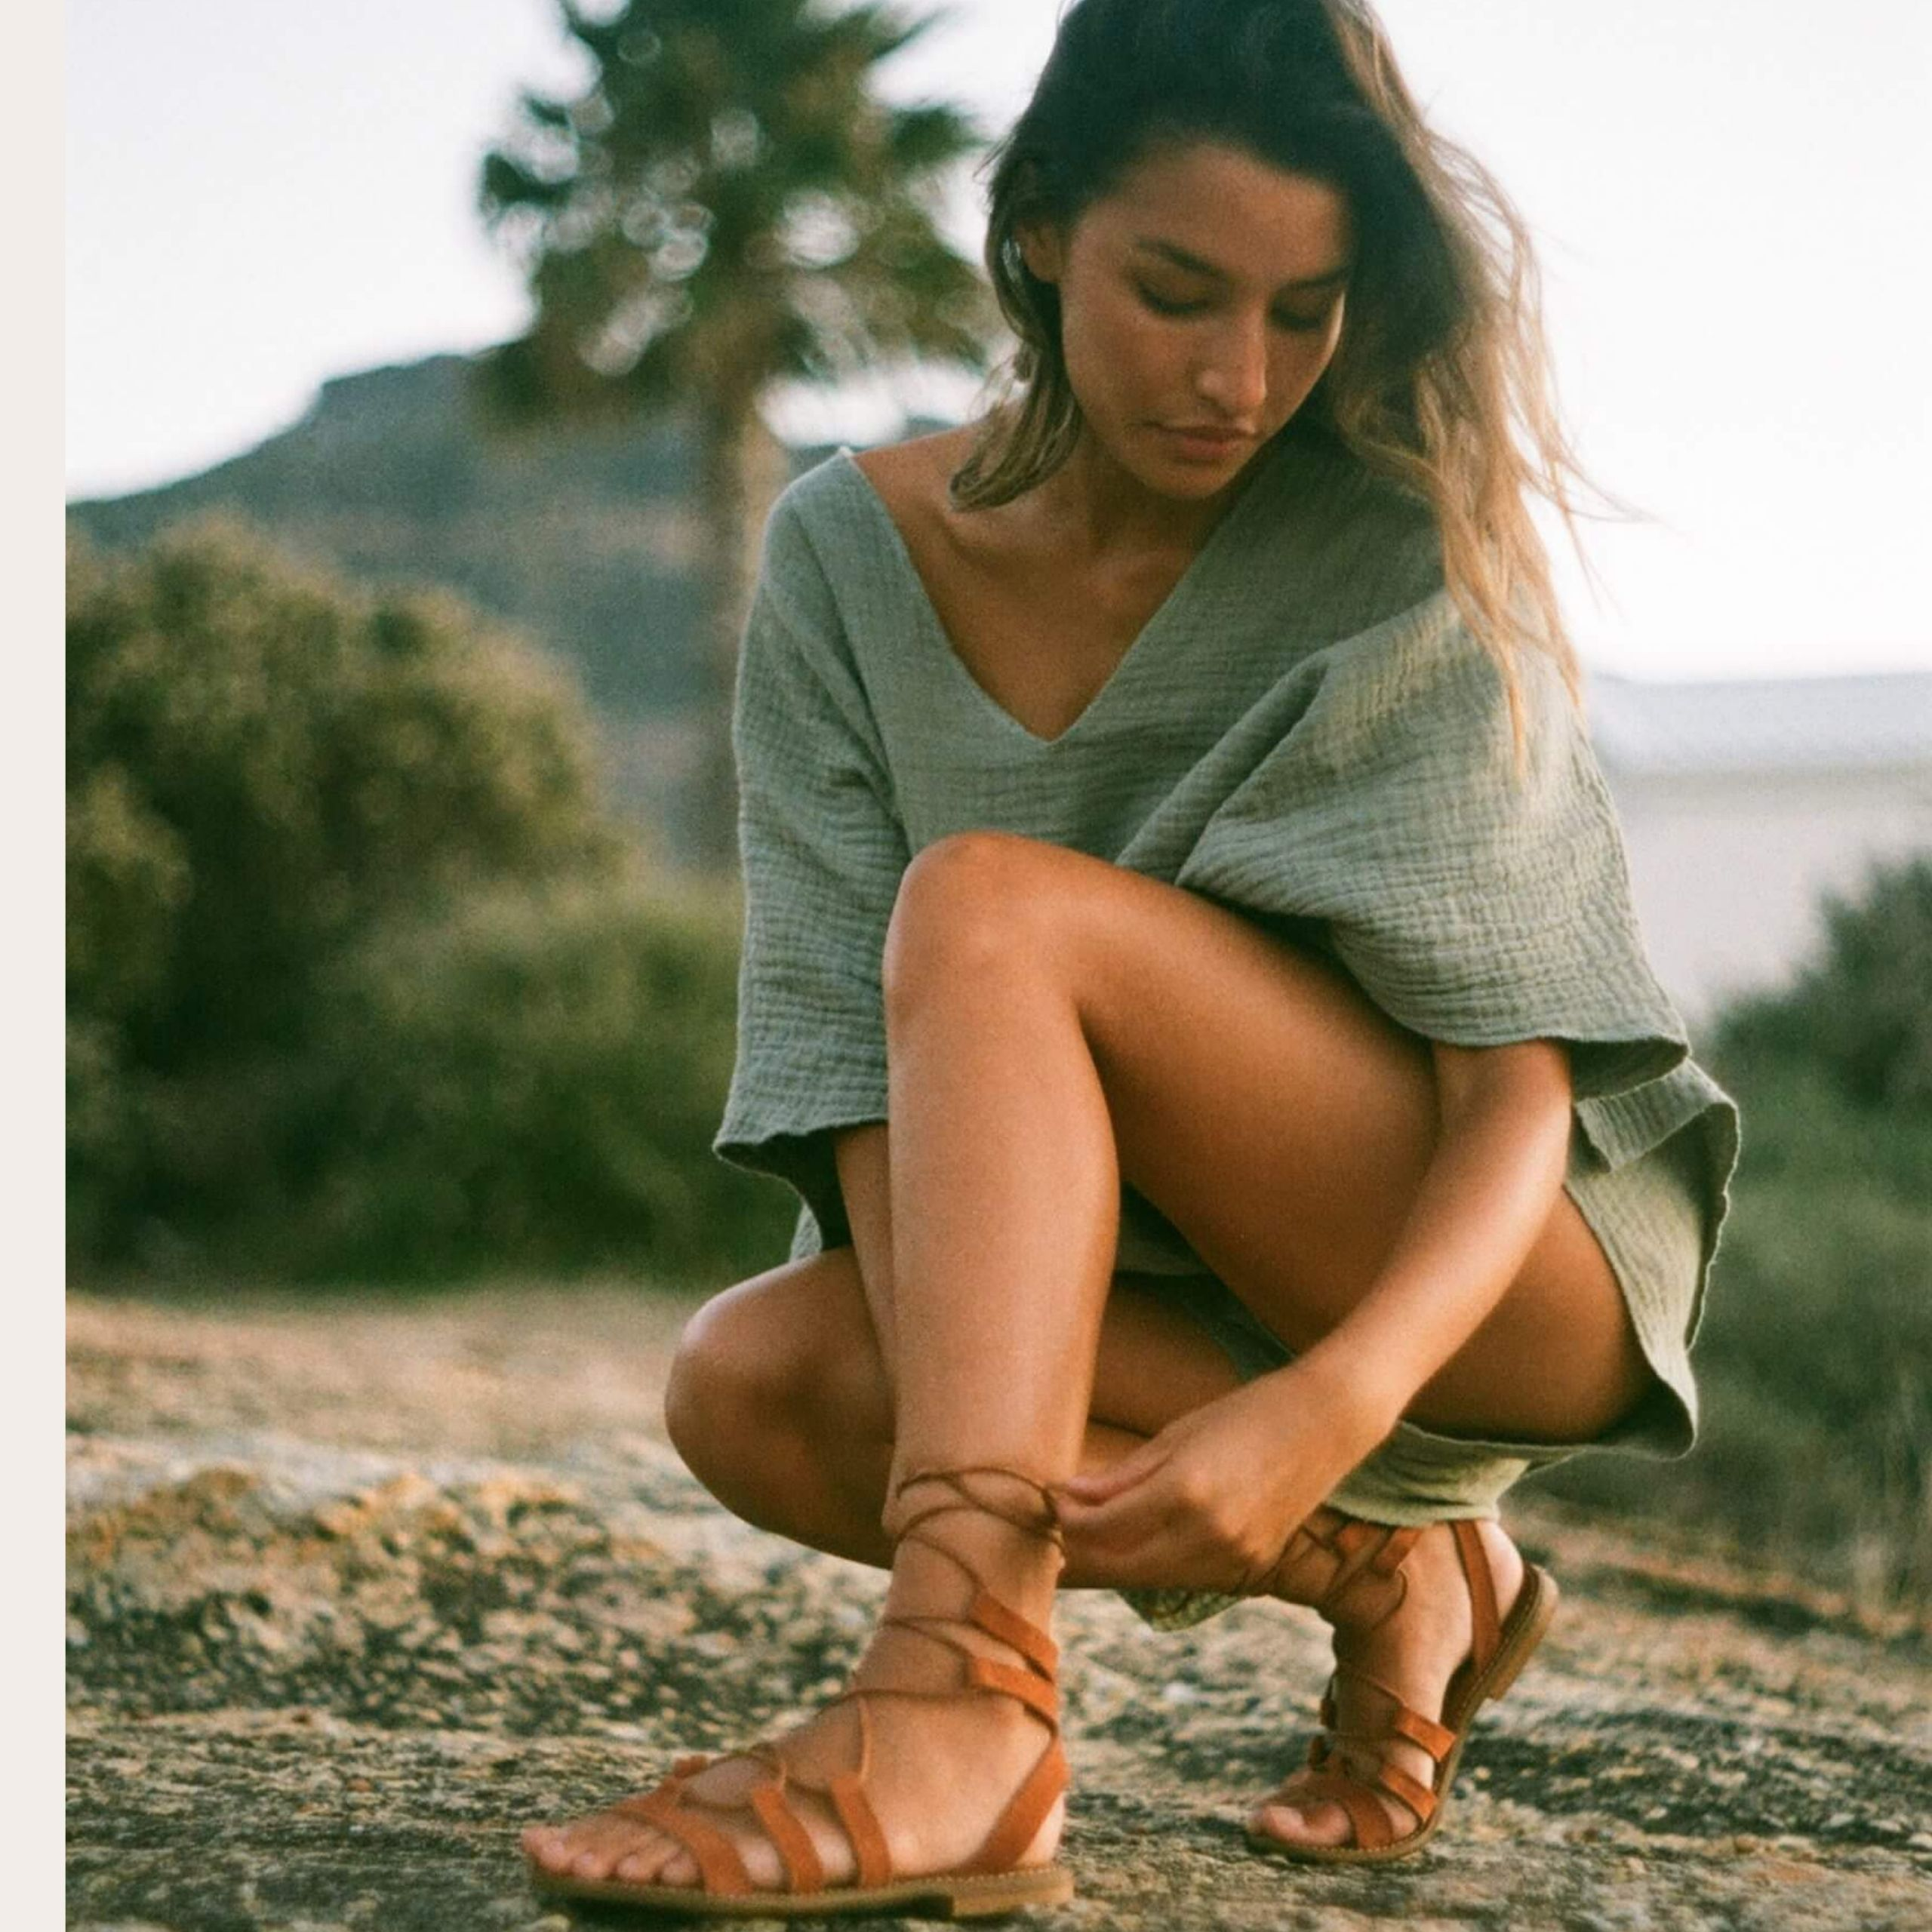 fe-1_lintsandalen sandals travelsandals vegan sustainable sandals wikkelsandalen